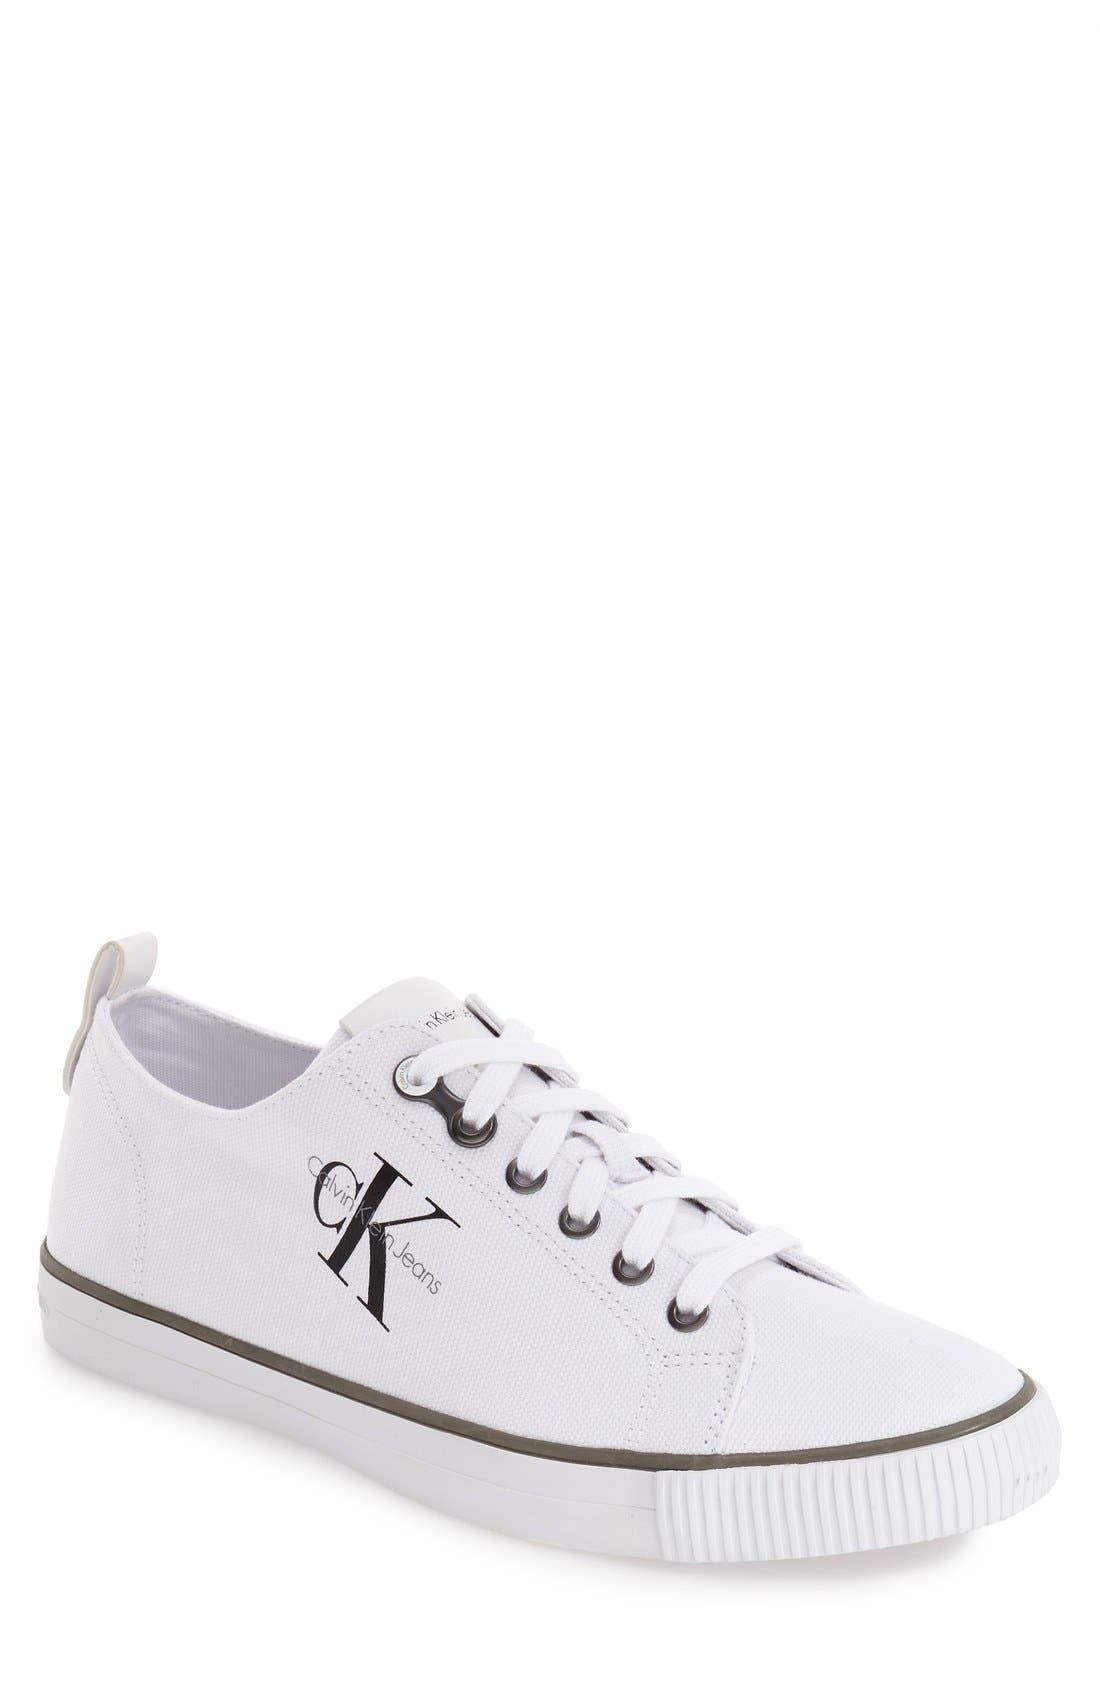 Calvin Klein Jeans 'Arnold' Lace-Up Sneaker (Men)